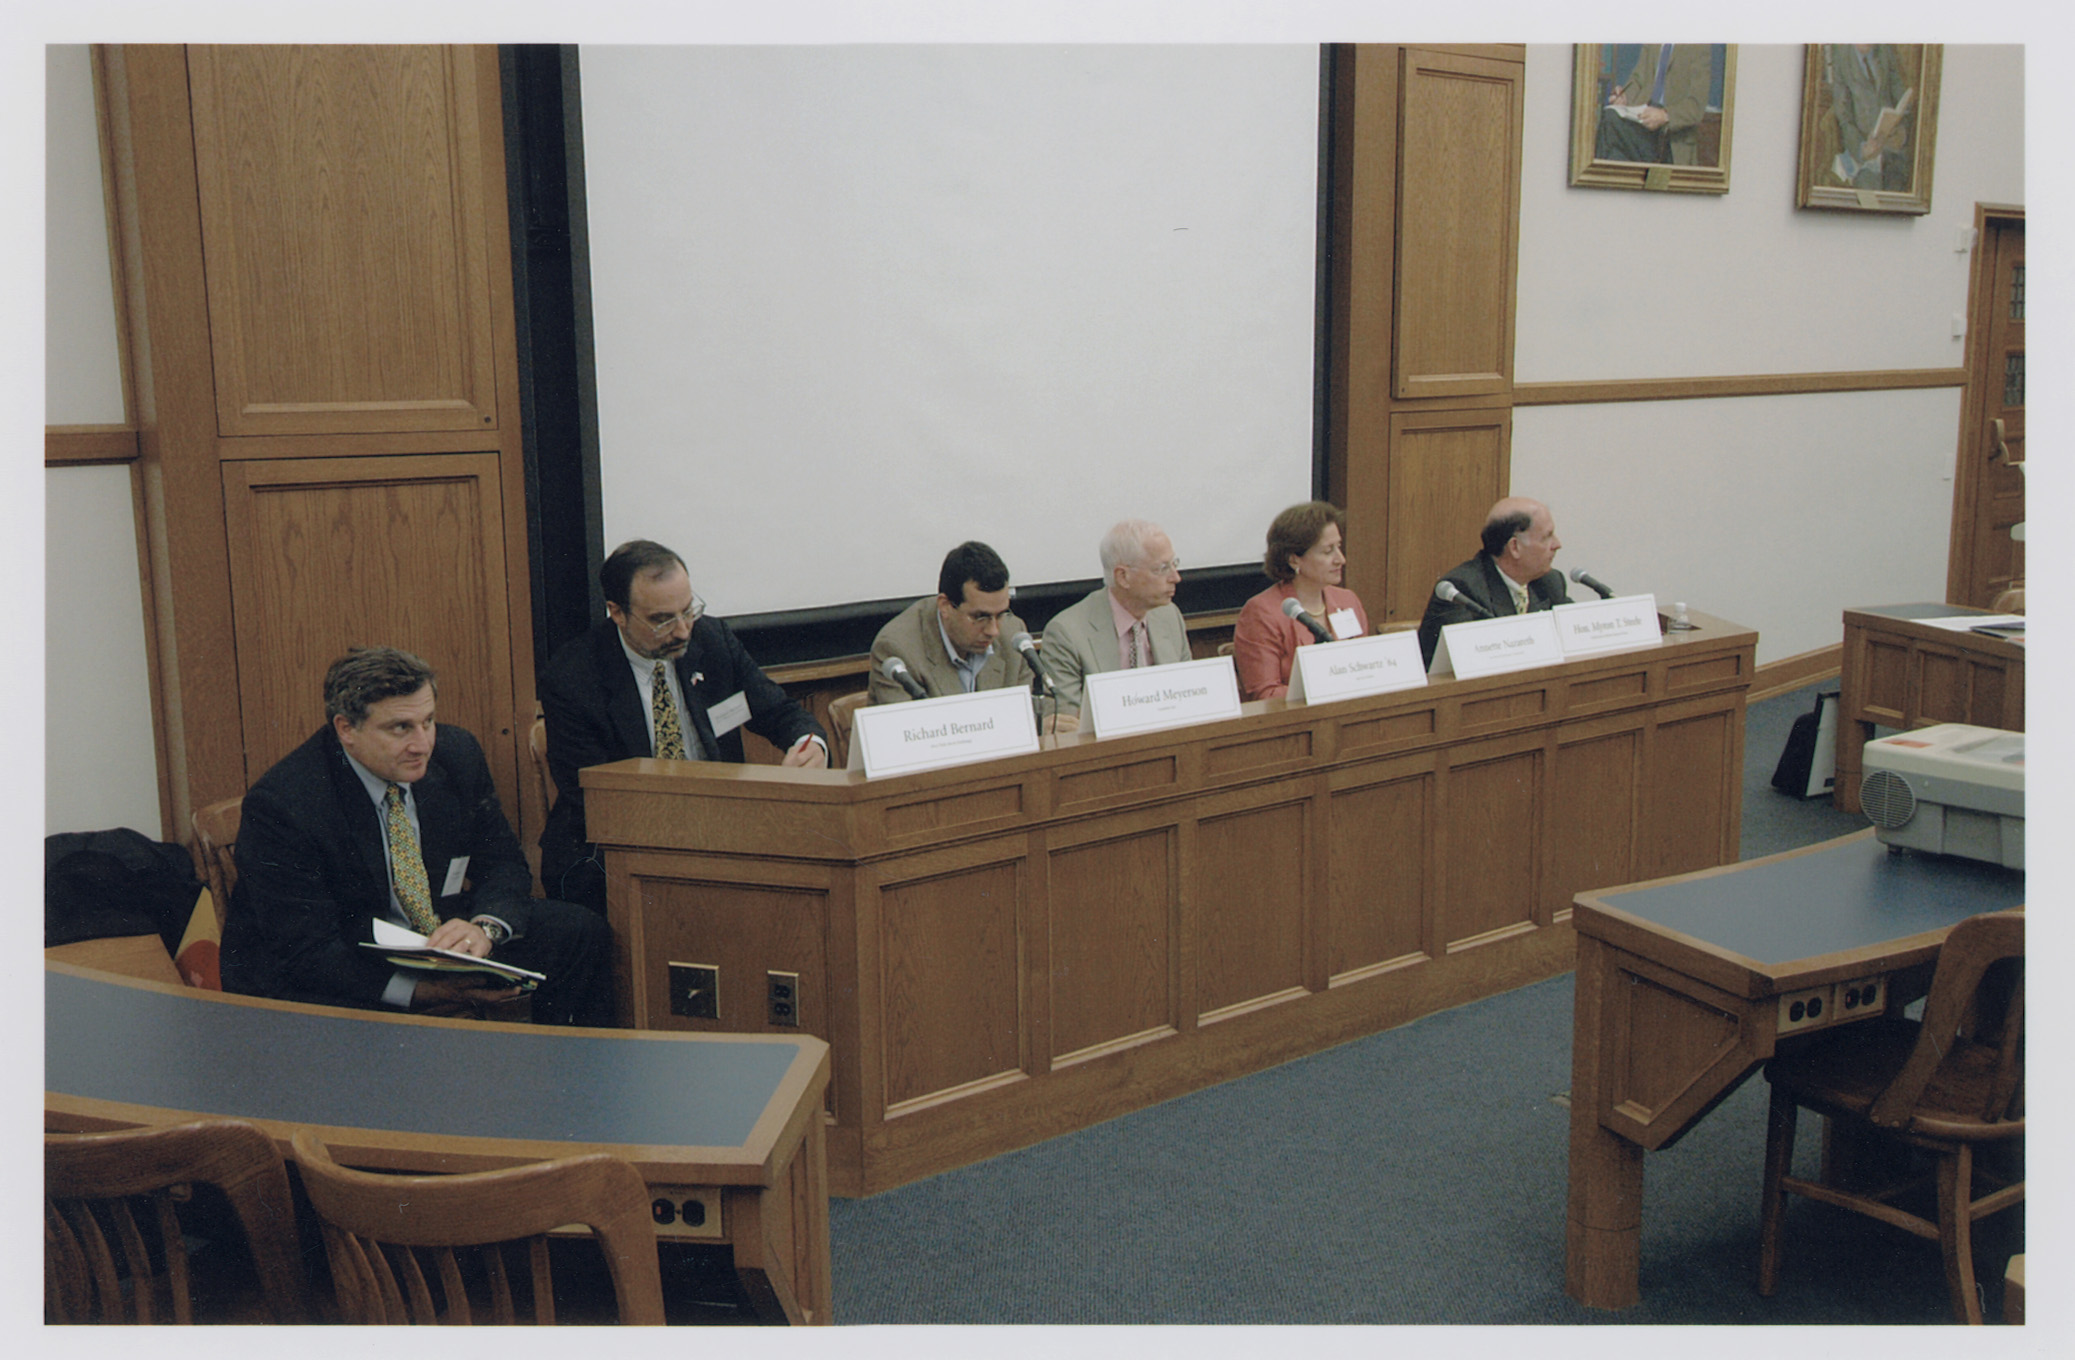 YLS Prof. Jonathan Macey '82, Richard Bernard, Howard Meyerson, YLS Prof. Alan Schwartz '64, Annette L. Nazareth, and Hon. Myron T. Steele